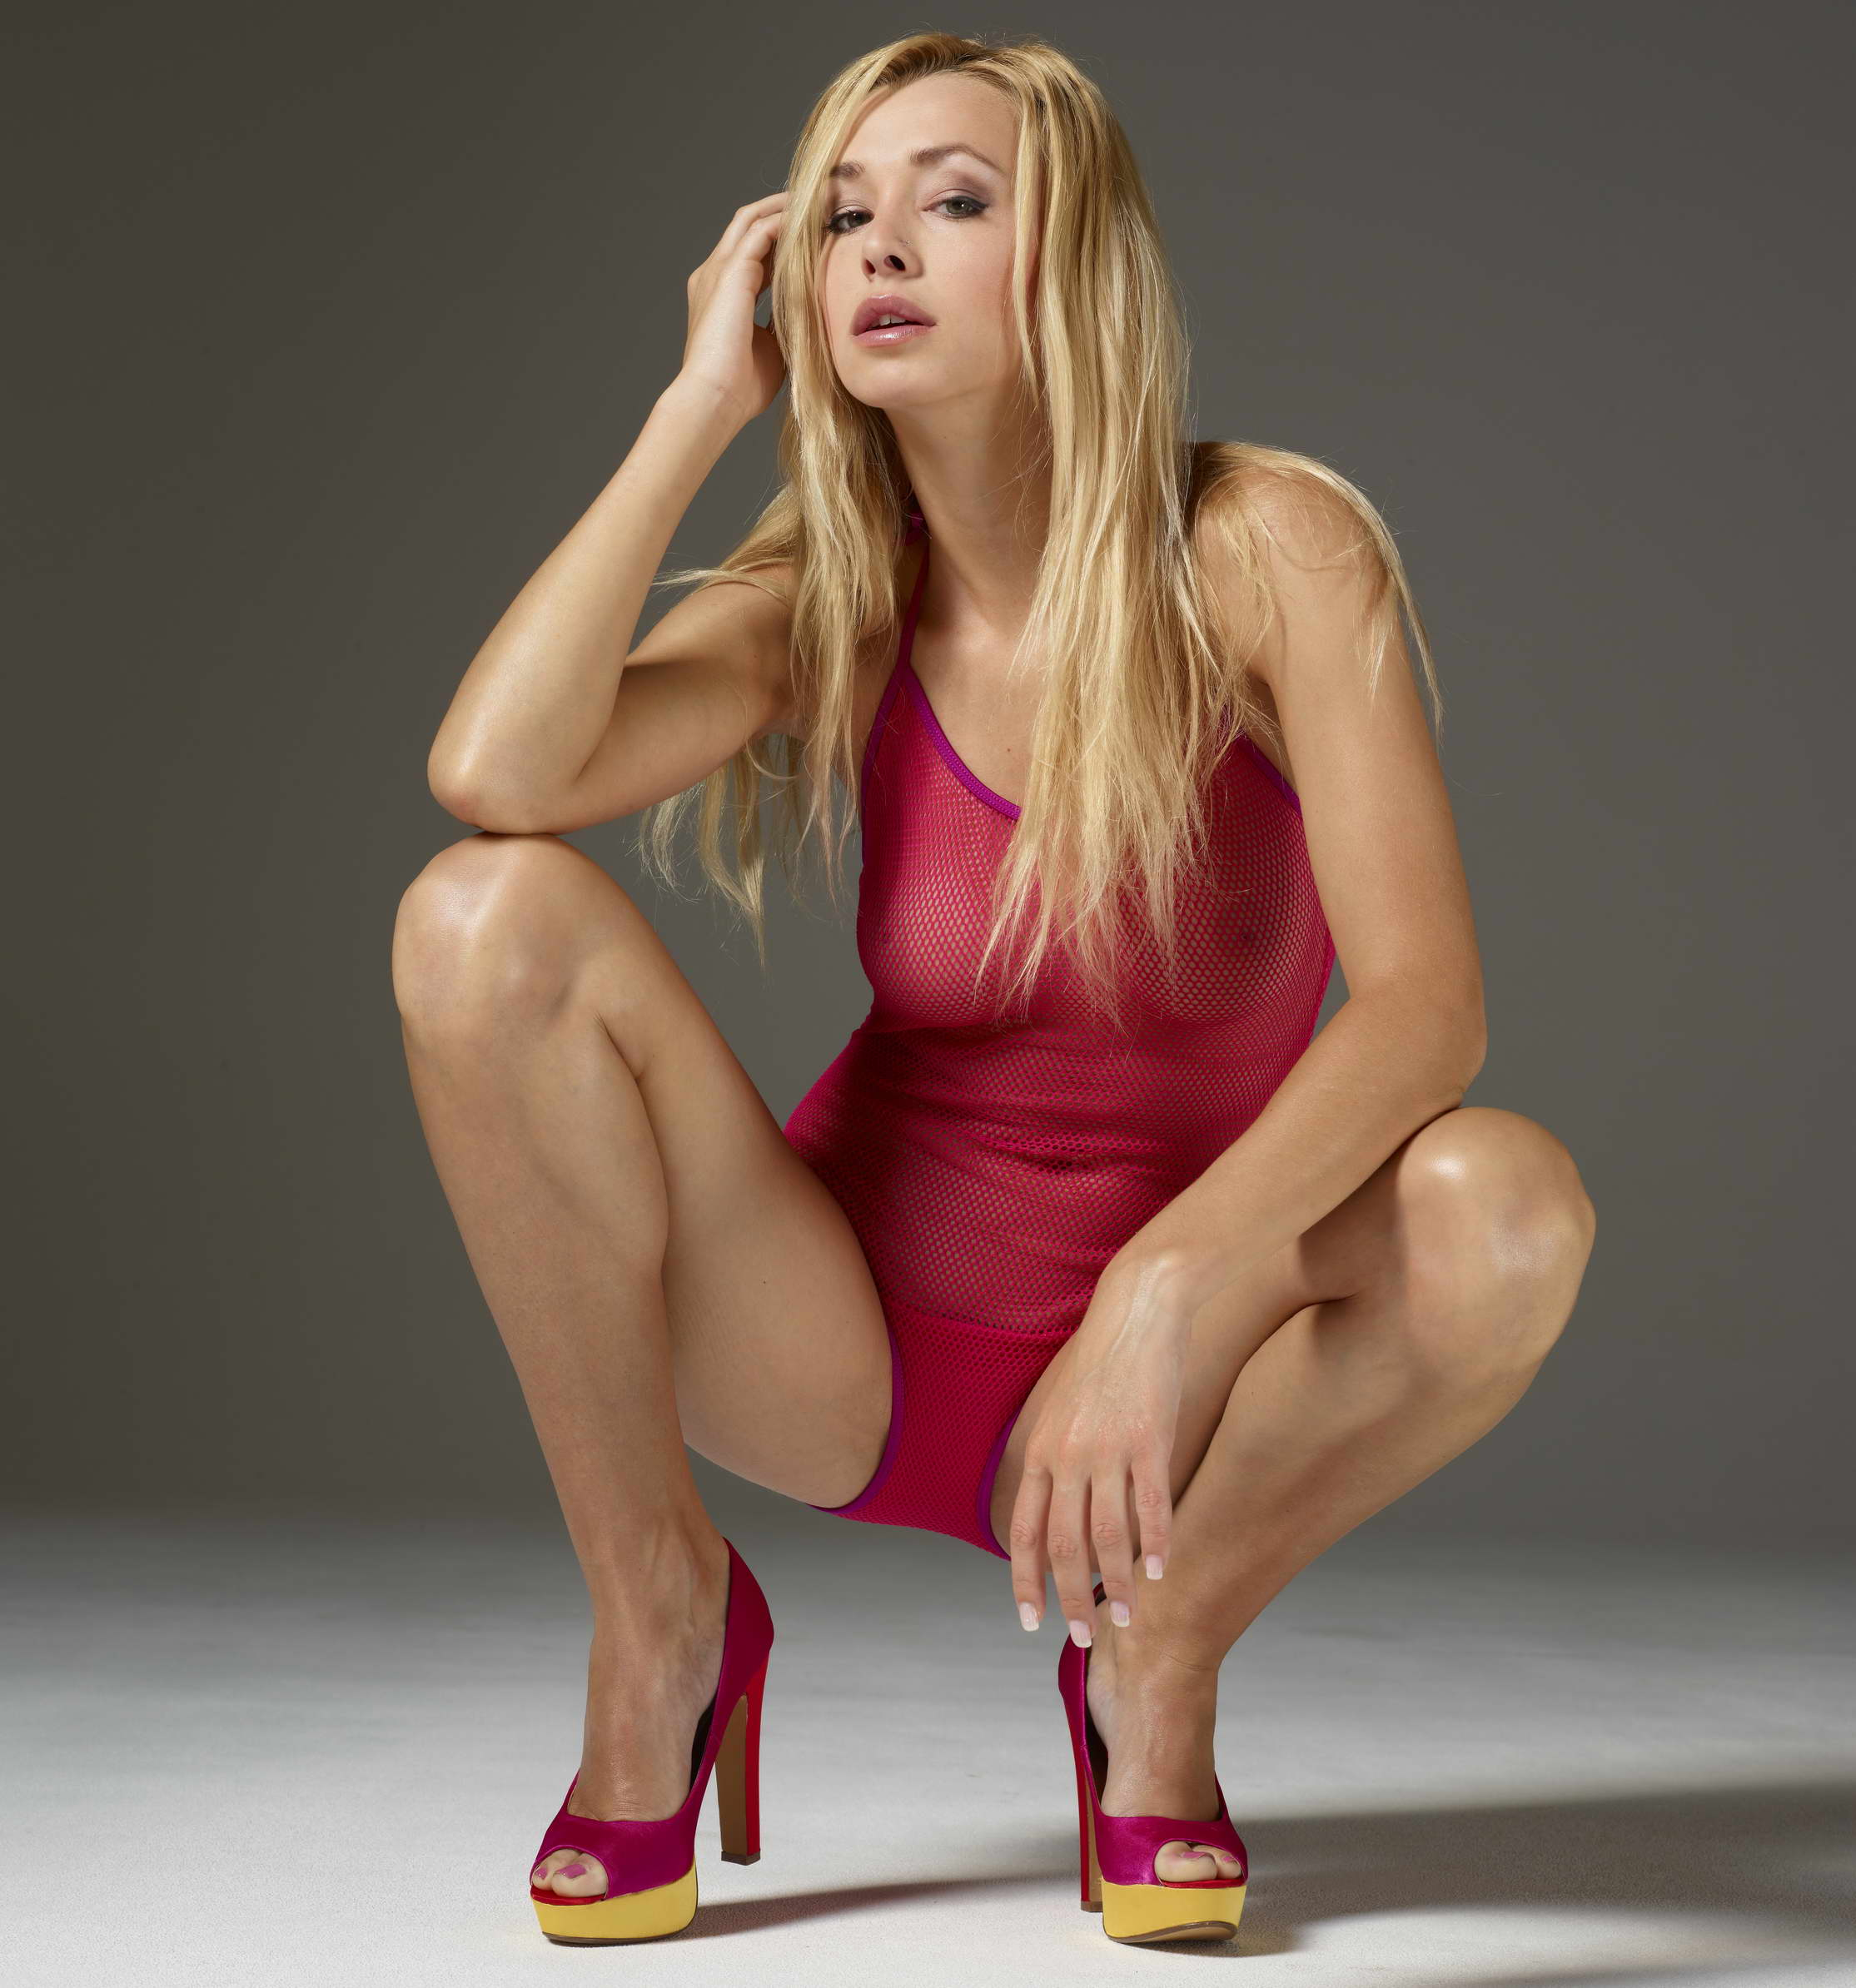 Gorgeous Blonde - 123LondonEscorts